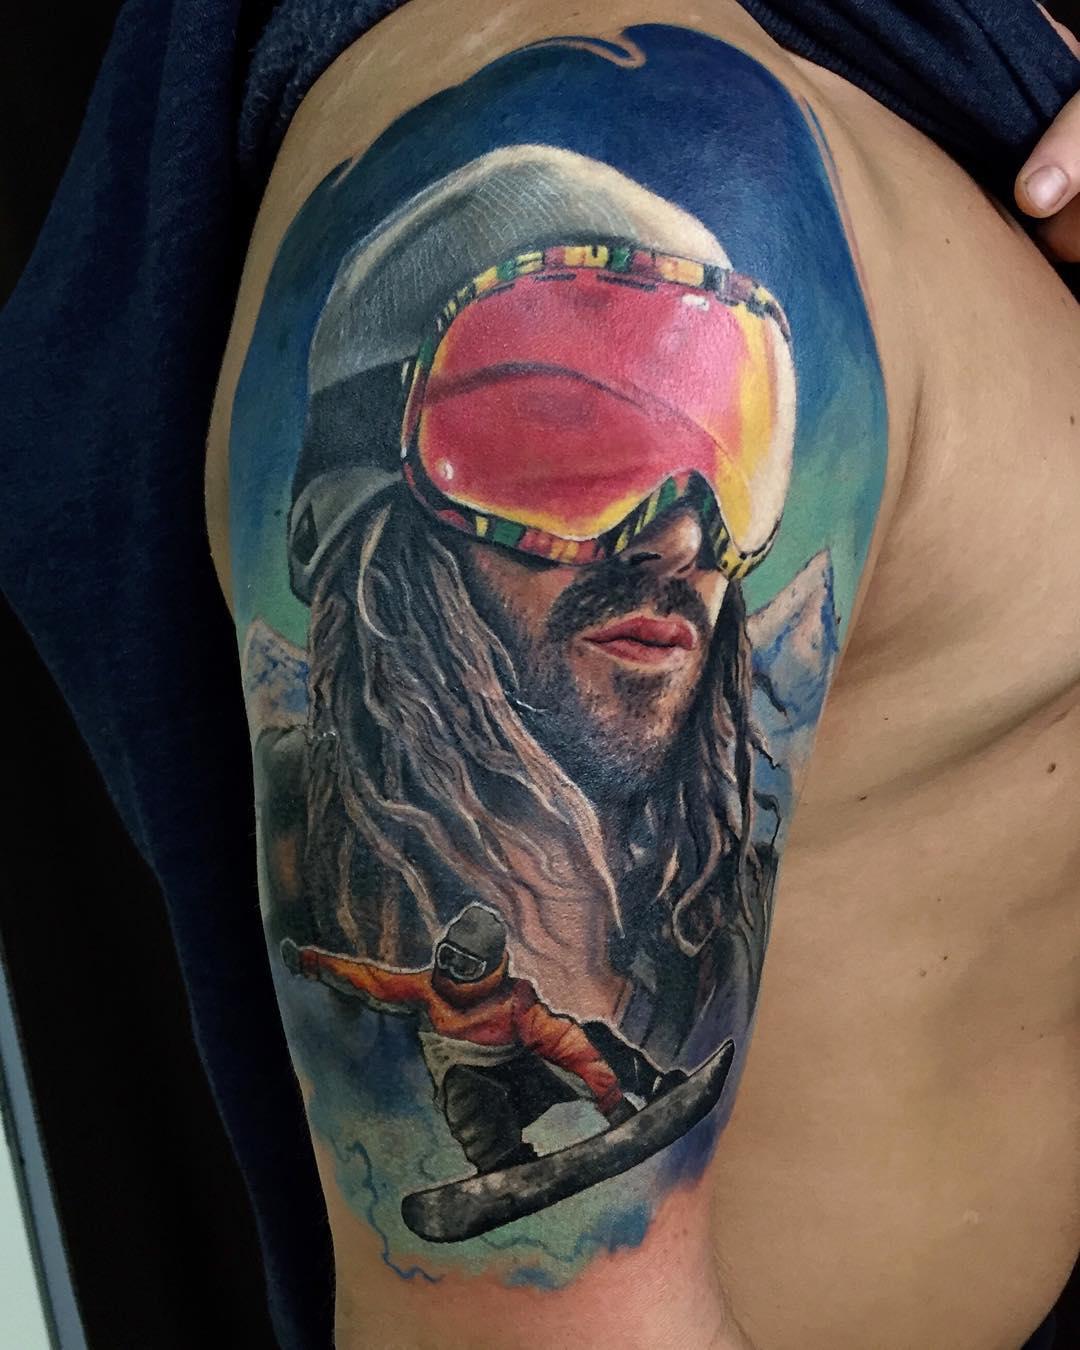 Snowboarder Tattoo on Shoulder